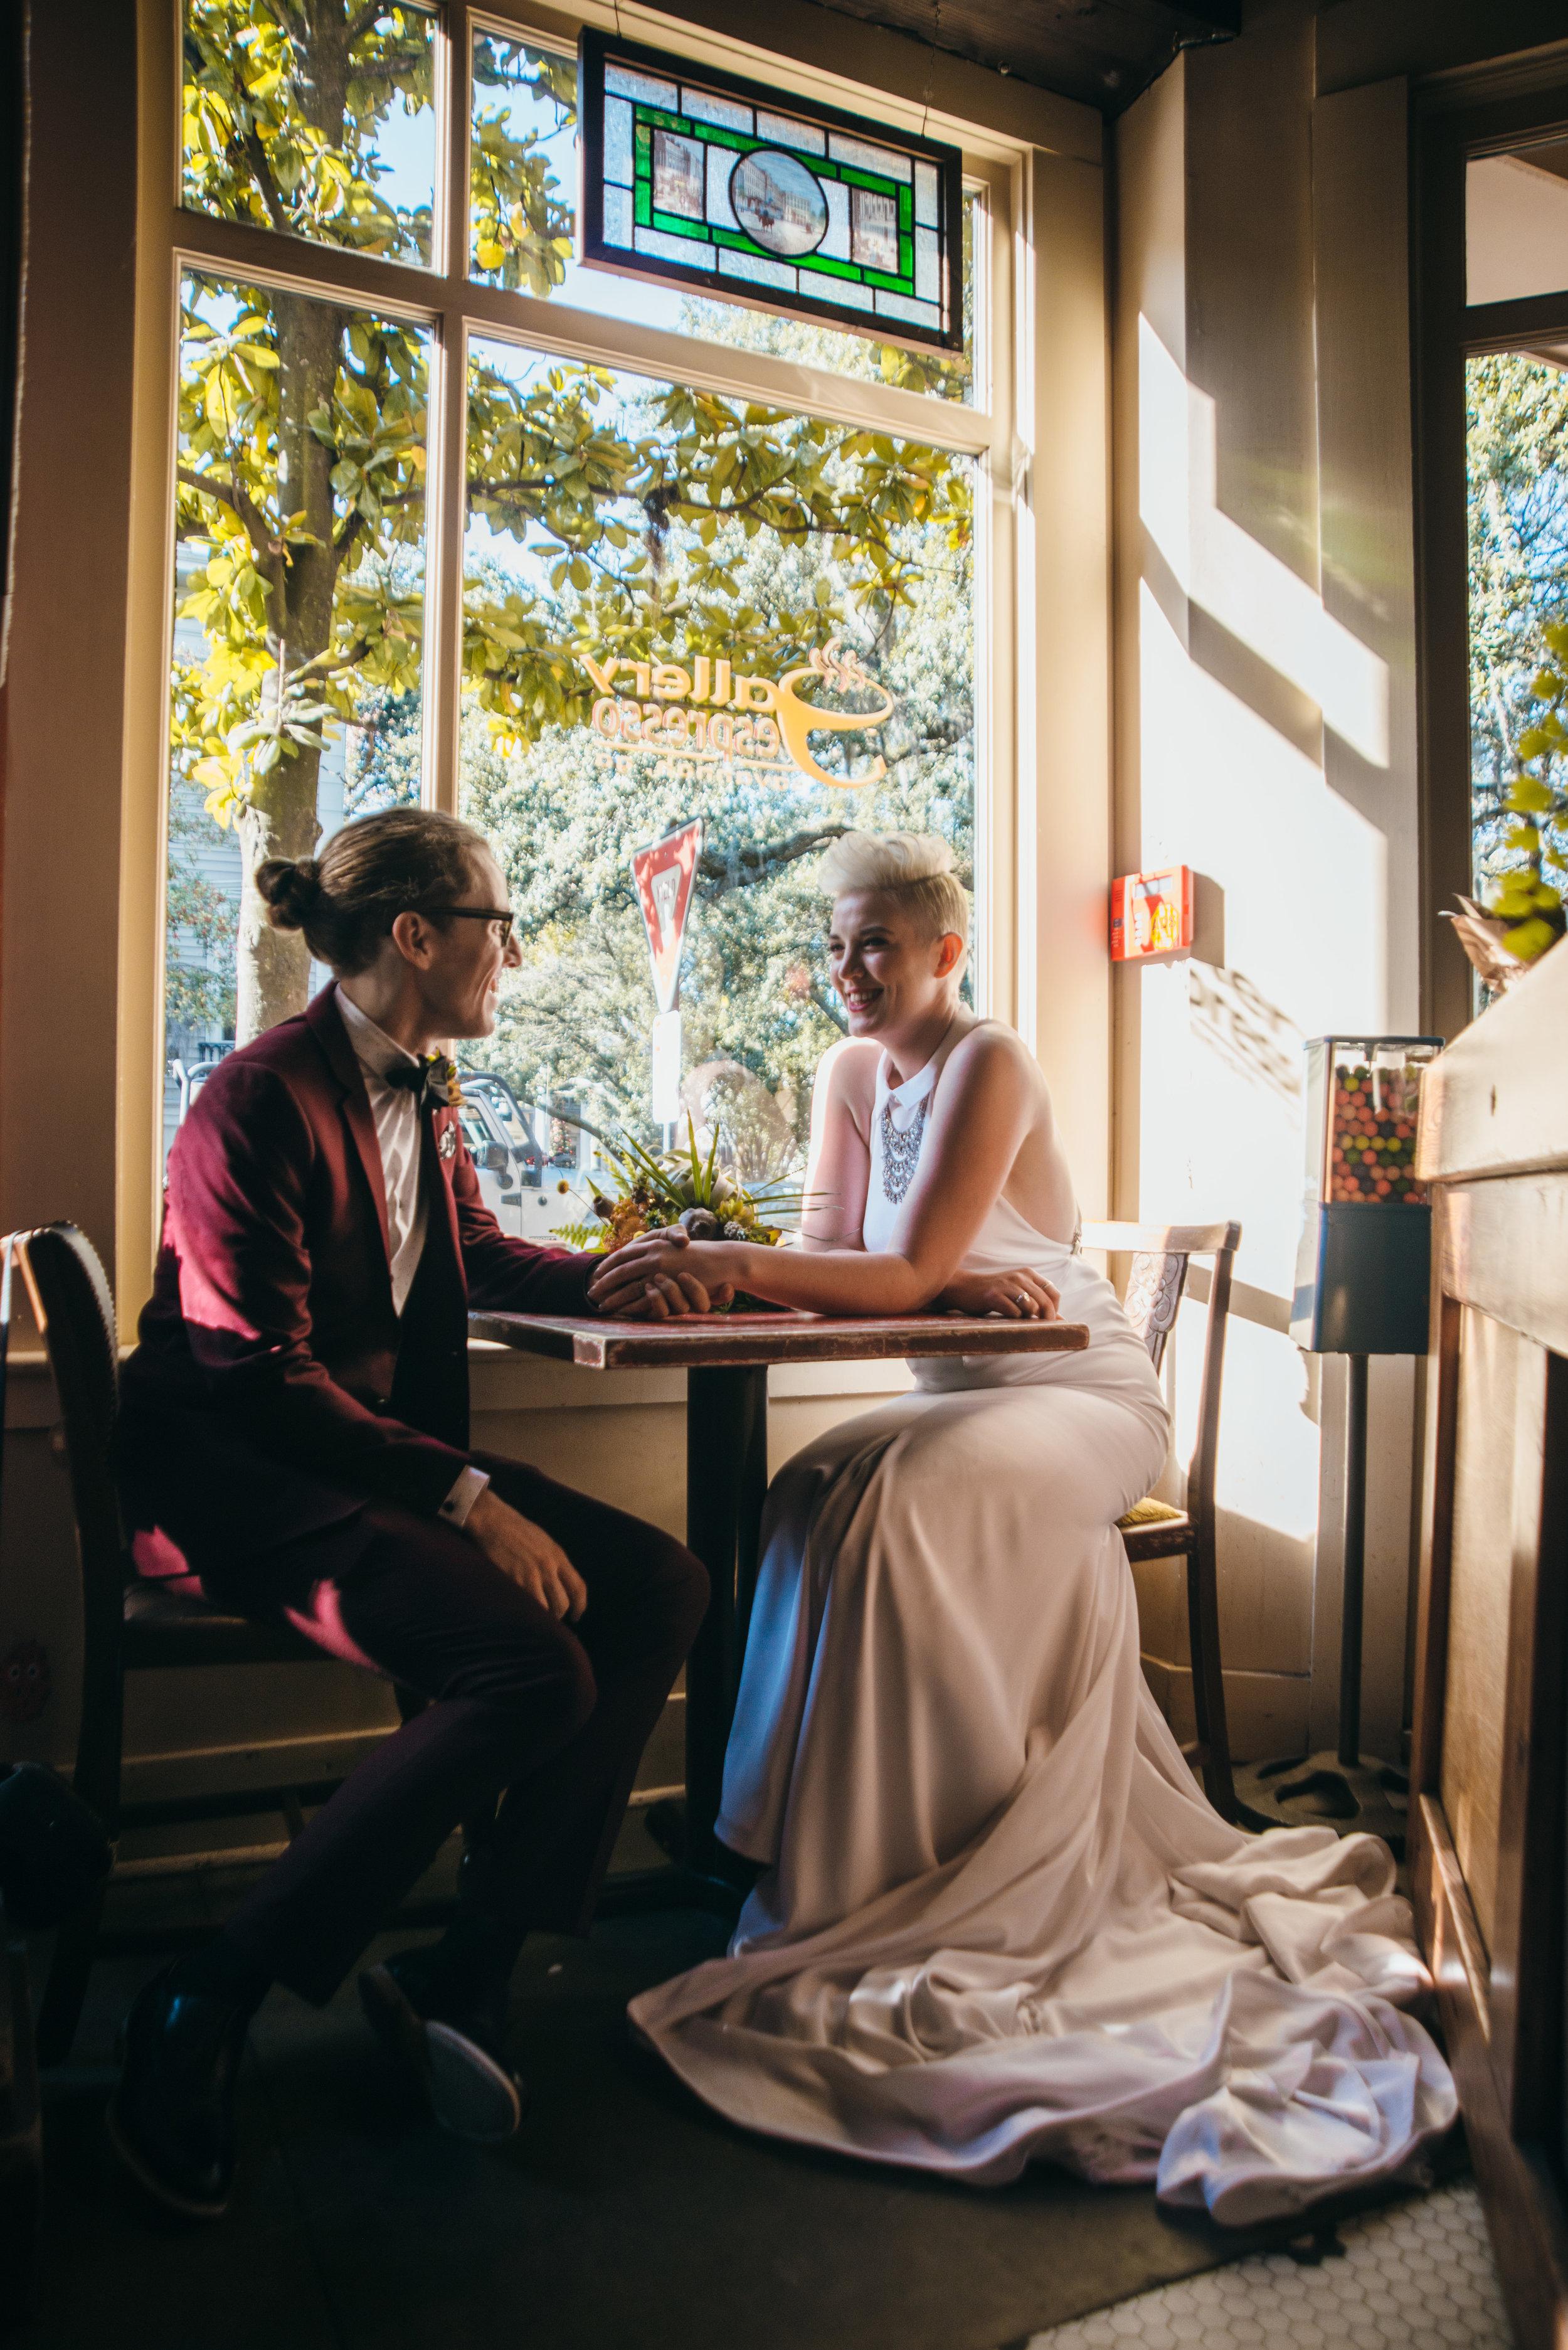 julia-hembree-photography-eden-village-church-wedding-savannah-warehouse-wedding-ivory-and-beau-bridal-boutique-savannah-florist-savannah-wedding-planner-savannah-event-design-scad-wedding-artist-wedding-savannah-funky-wedding-handmade-wedding-45.jpg